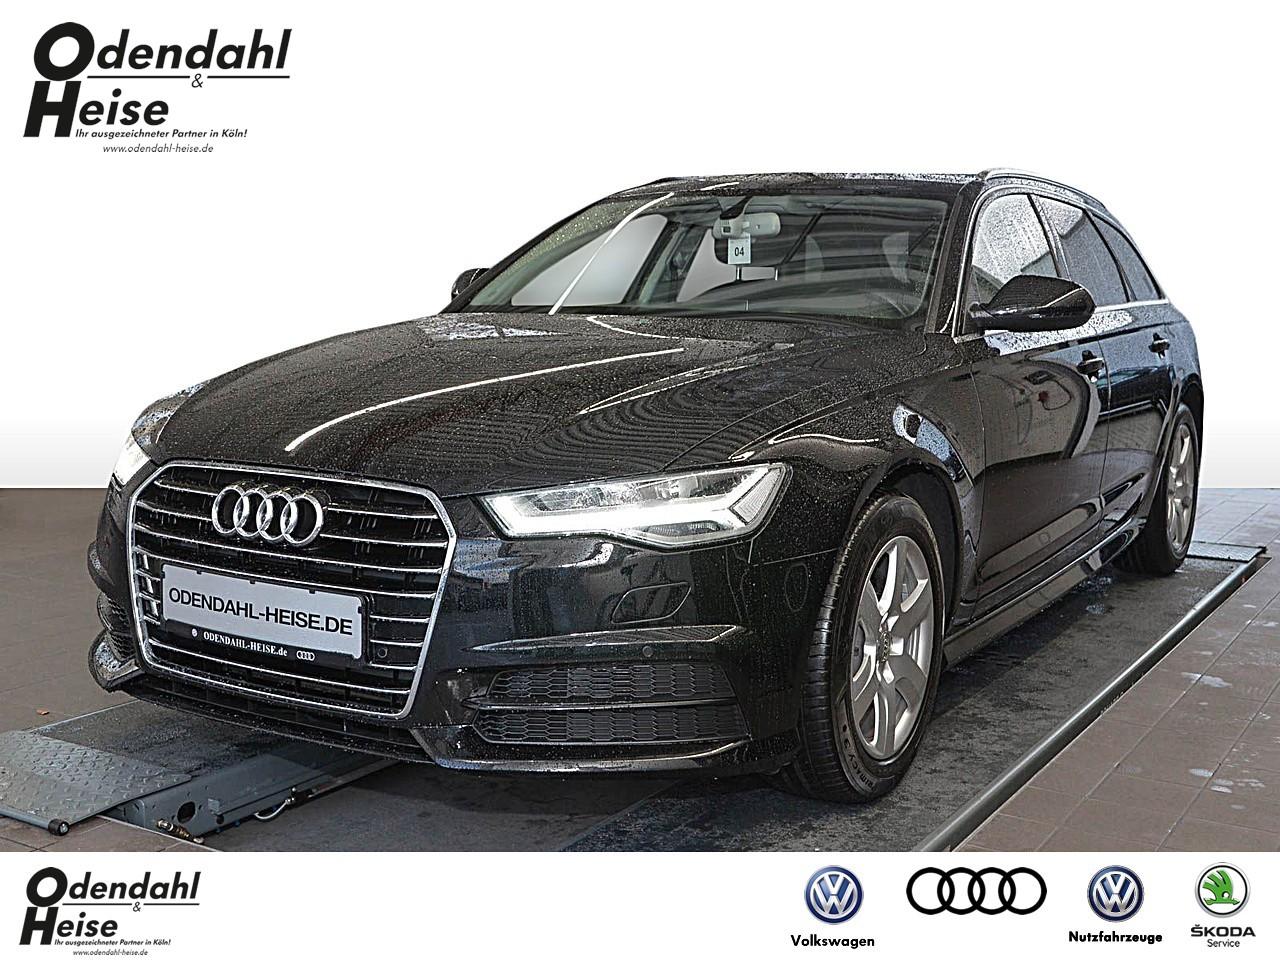 Audi A6 Avant 1.8 TFSI ultra S tronic Klima Navi, Jahr 2017, Benzin